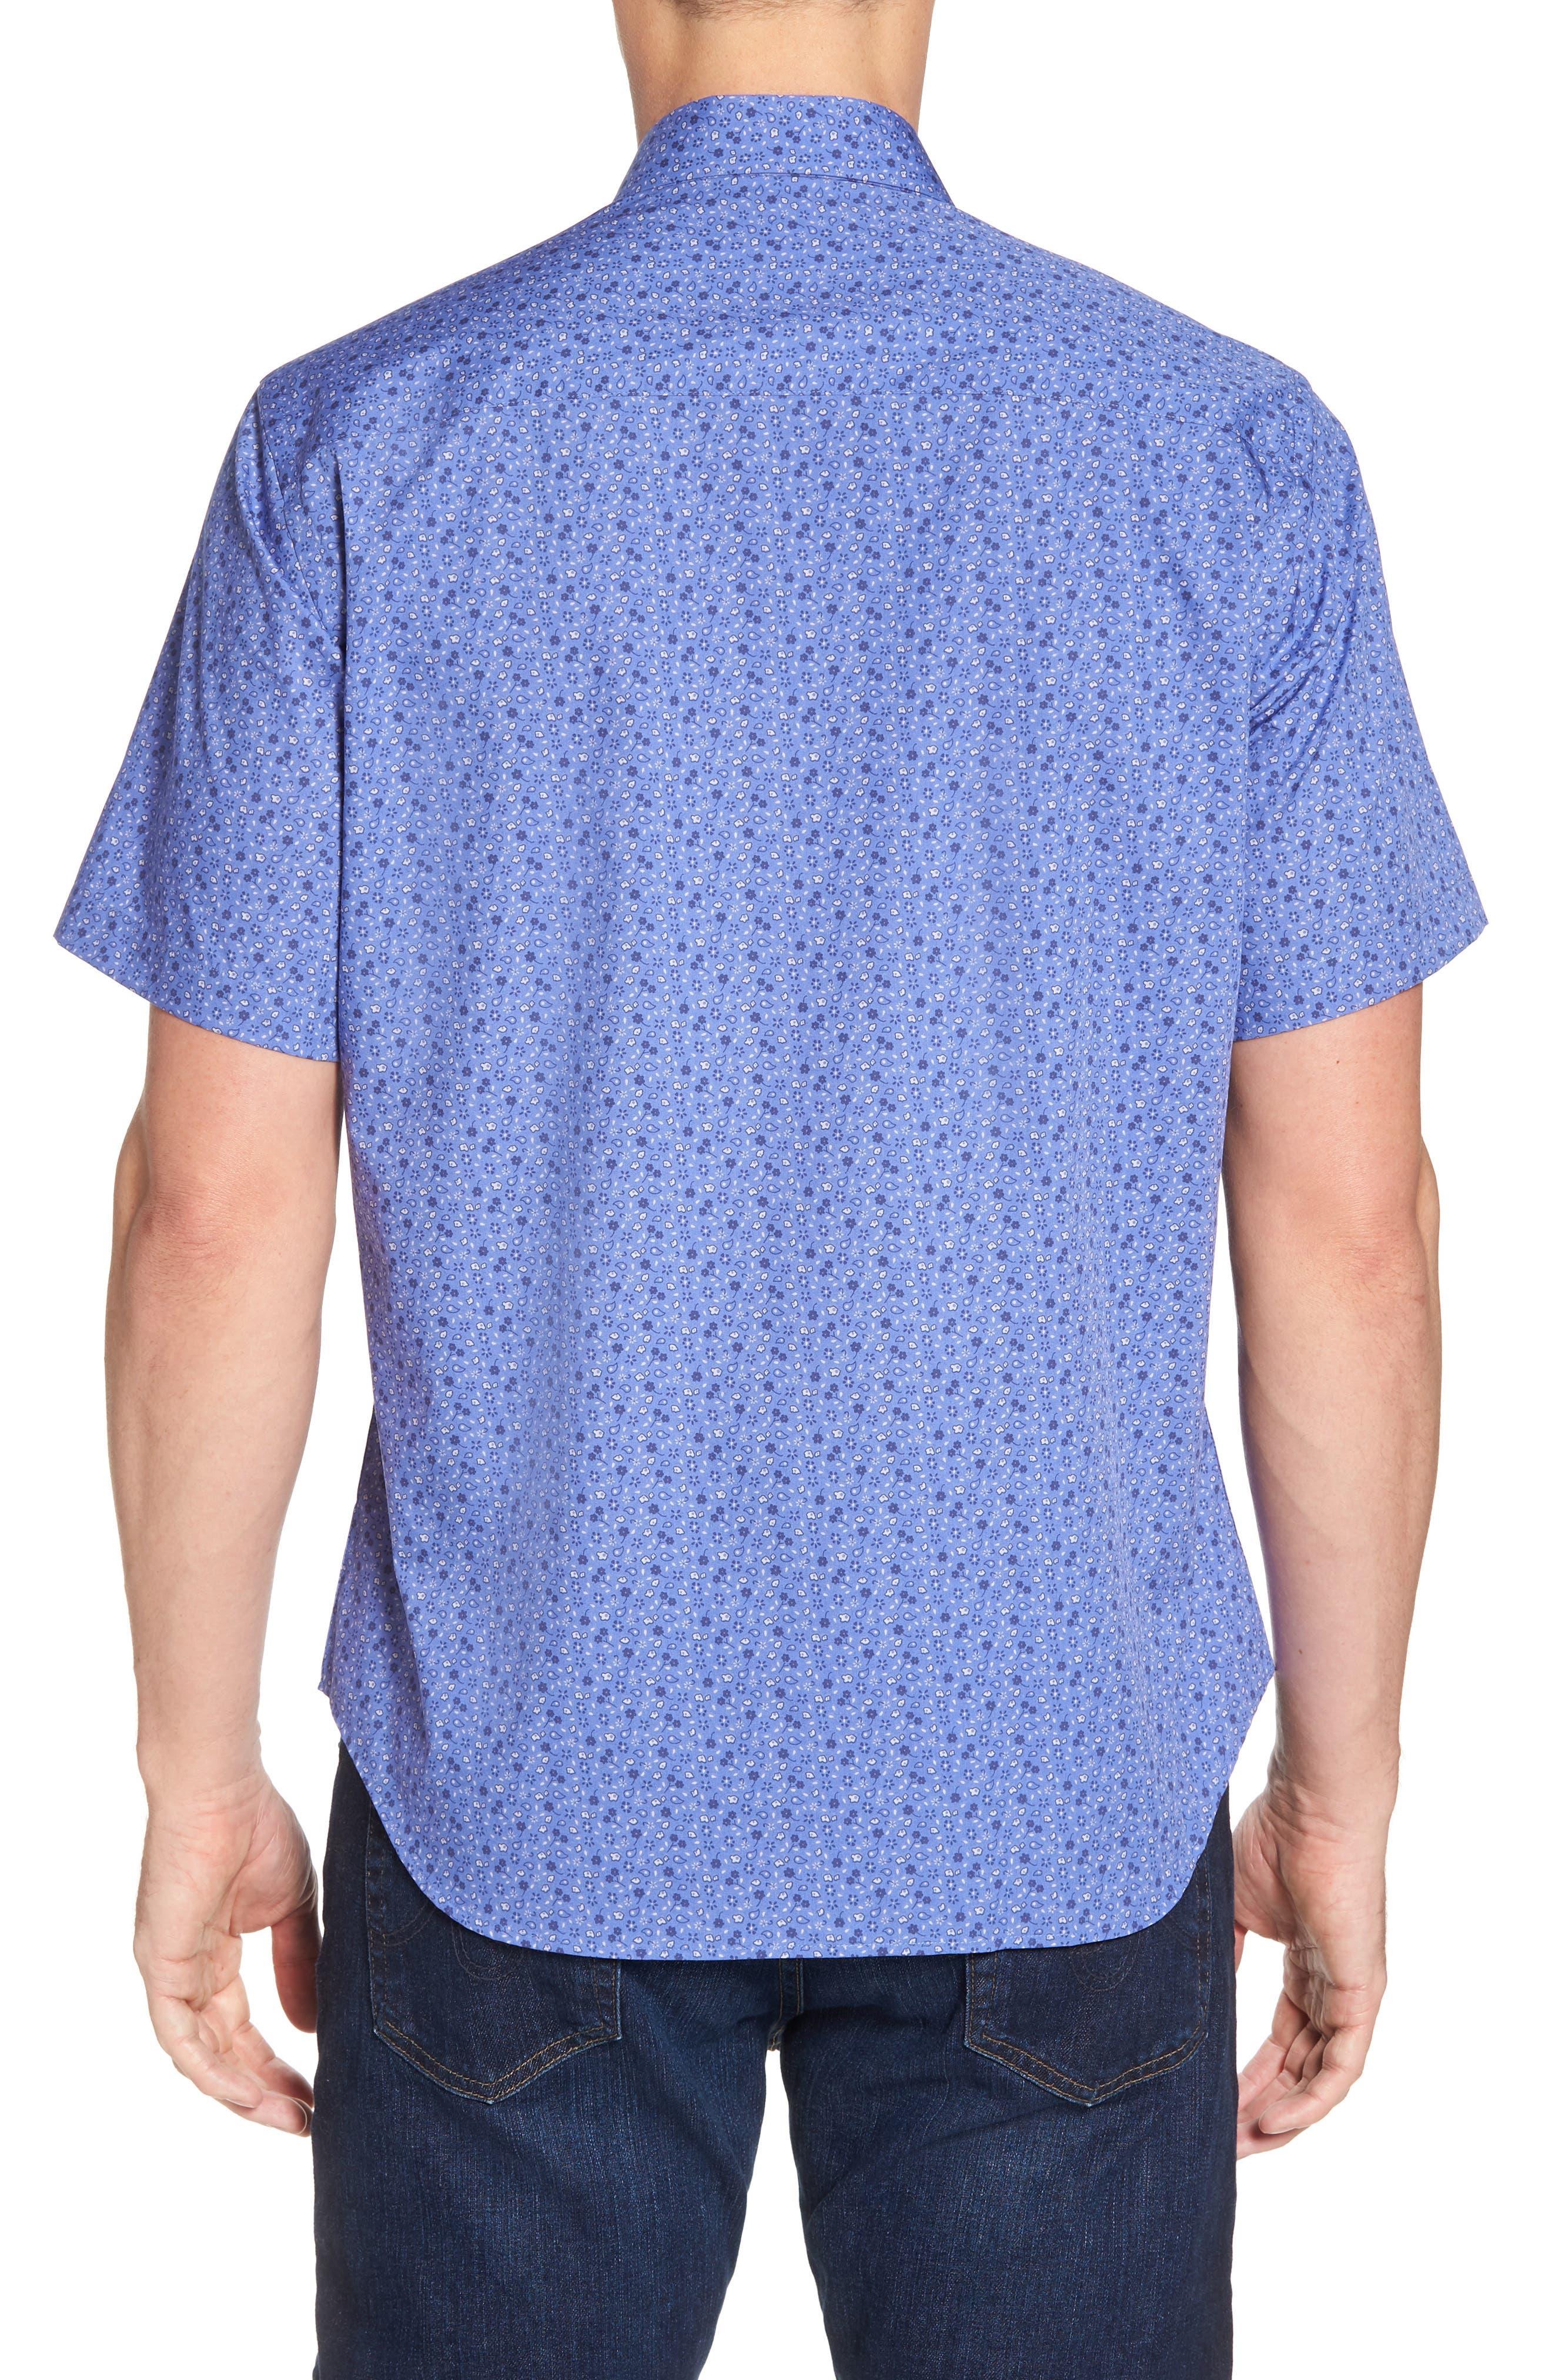 Ballou Regular Fit Floral Print Sport Shirt,                             Alternate thumbnail 2, color,                             Royal